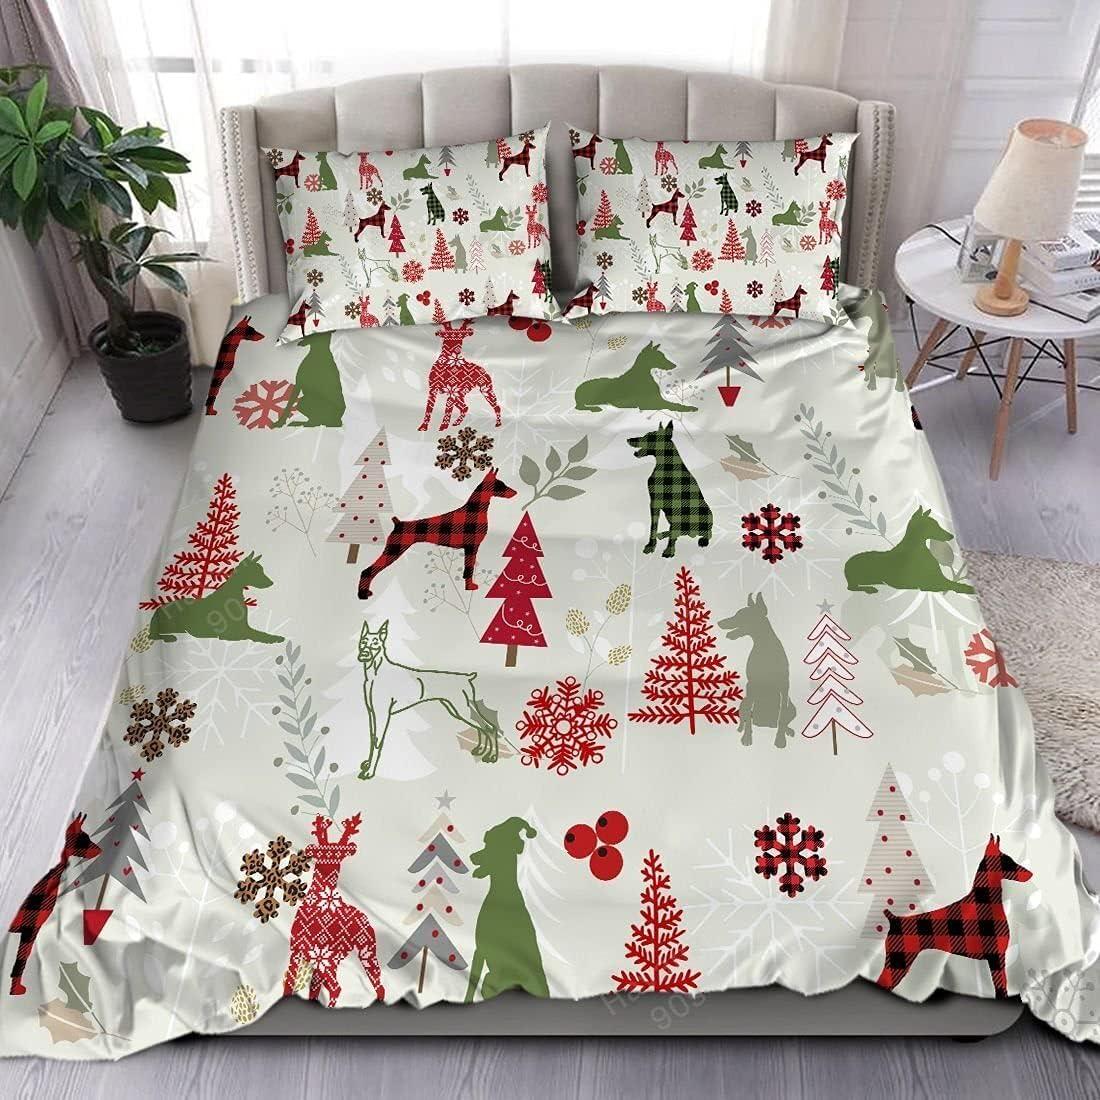 Ultra-Cheap Deals Doberman Bedding Set Christmas V2 Seattle Mall Flannel Comforters